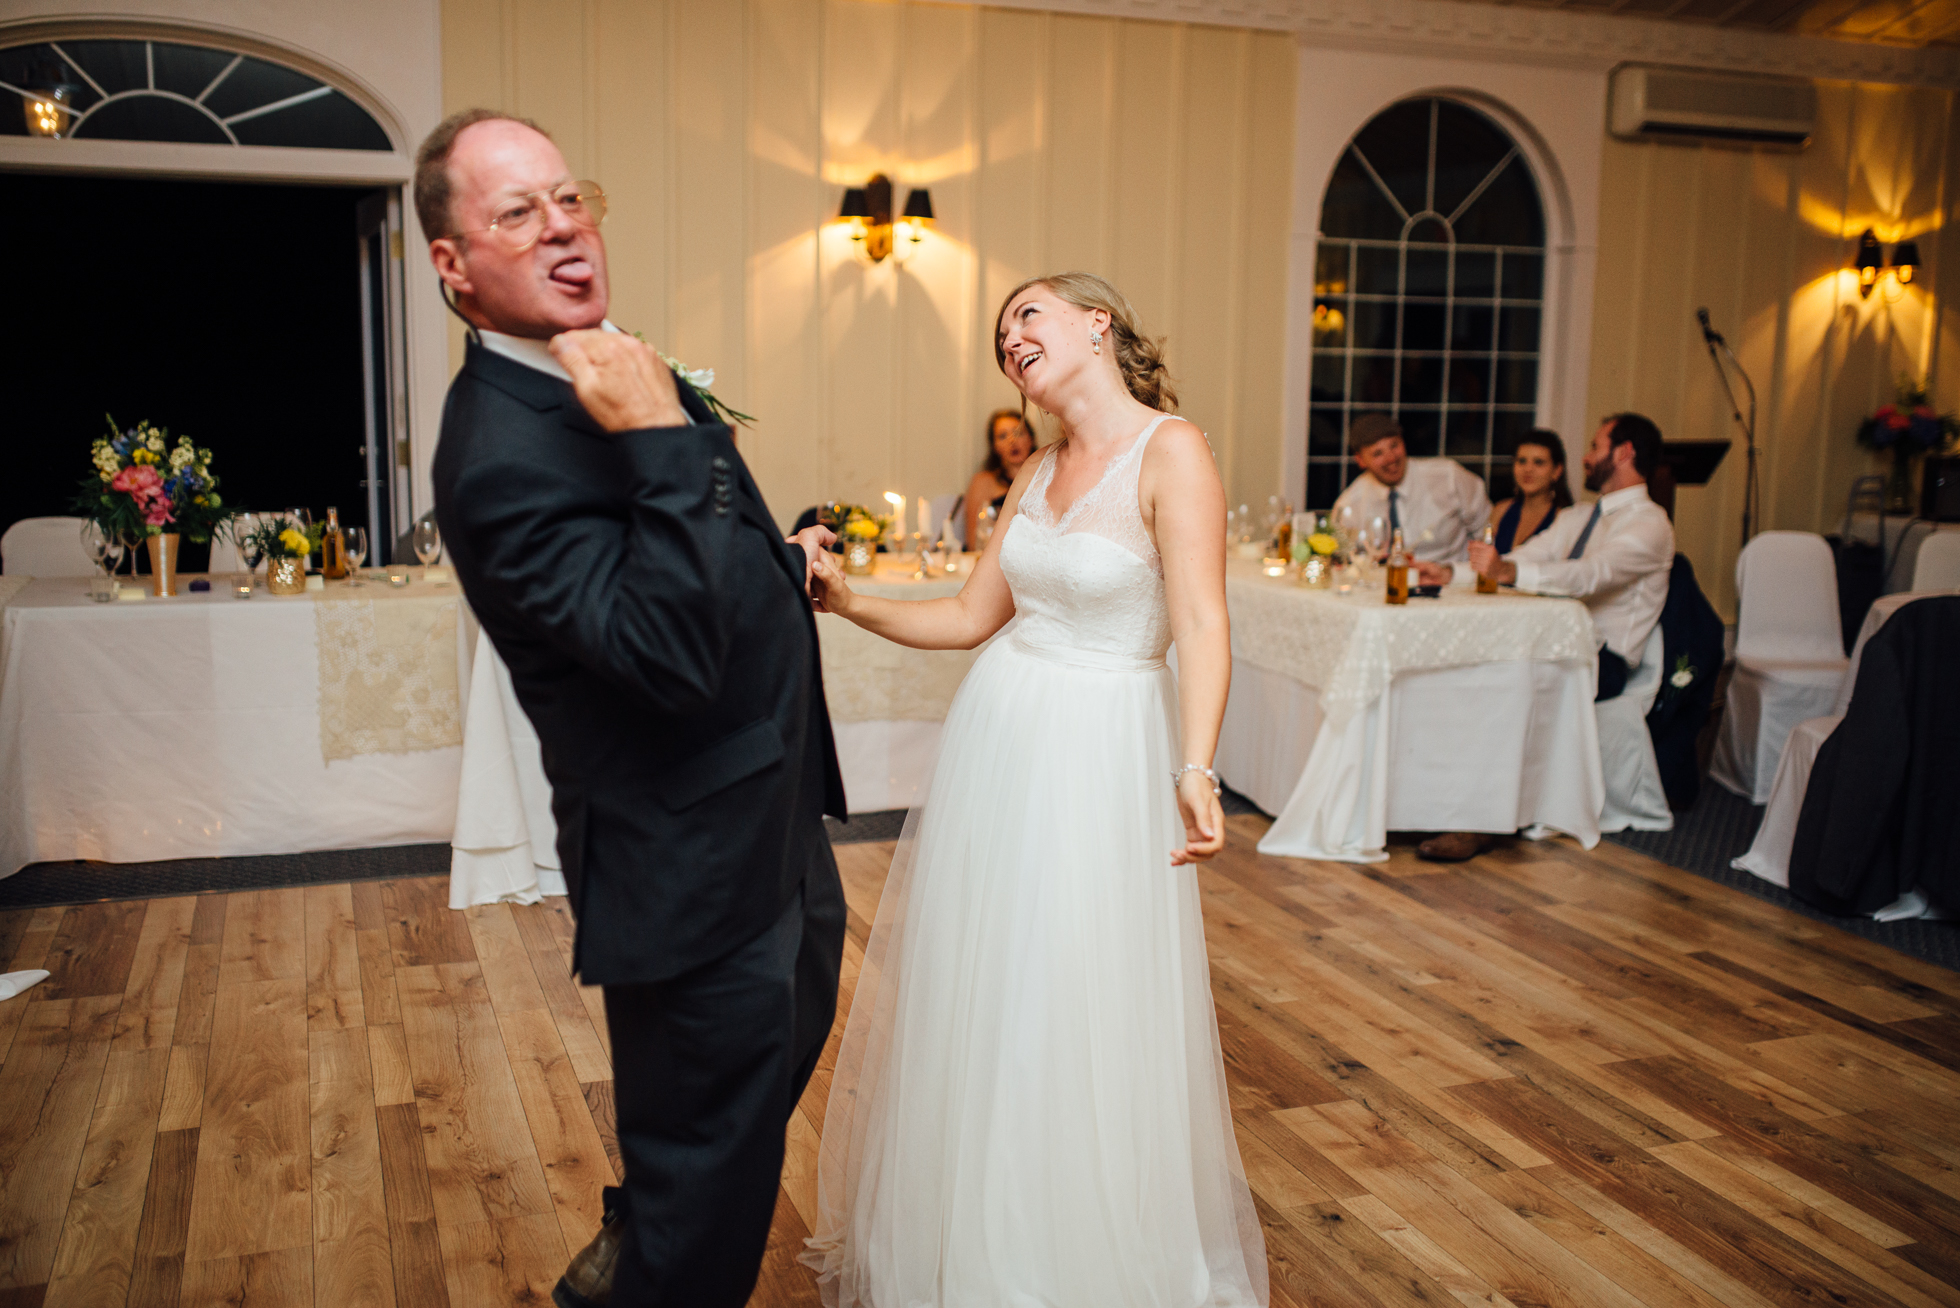 Outdoor-Caledon-Tralee-Wedding-Photography-112